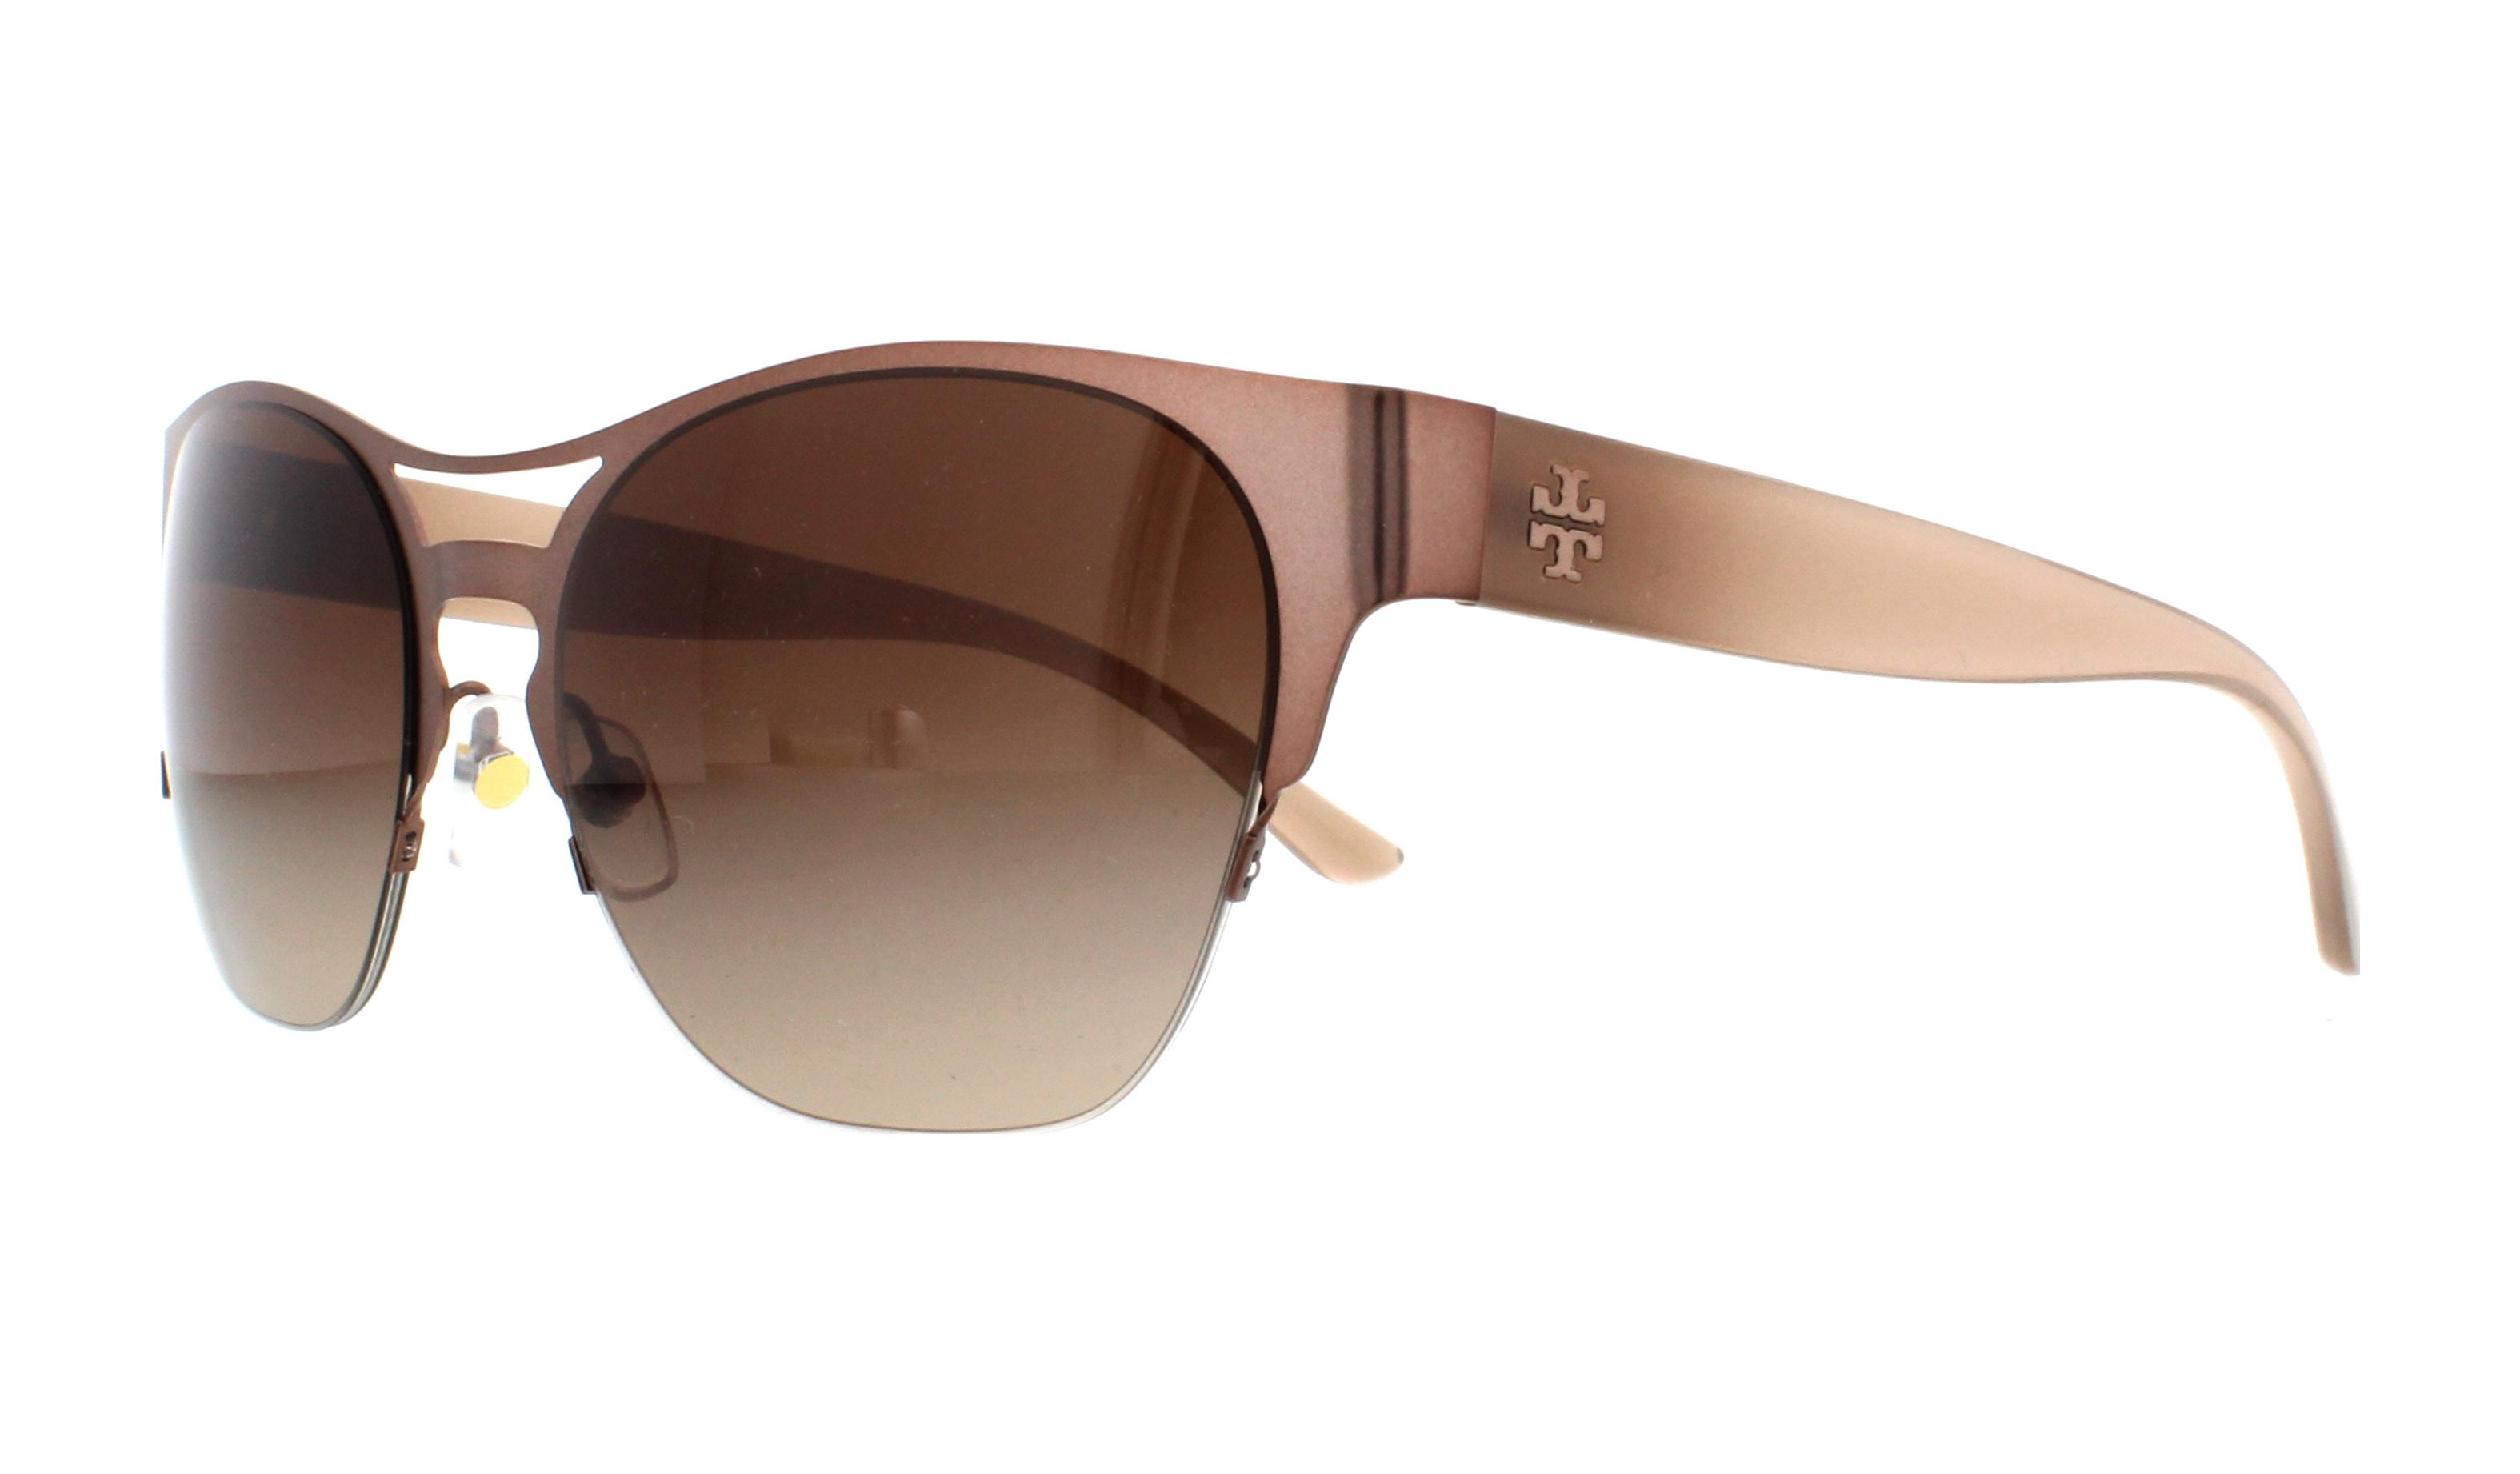 e360f74785 TORY BURCH Sunglasses TY6065 326813 Brown 56MM 725125004510 | eBay